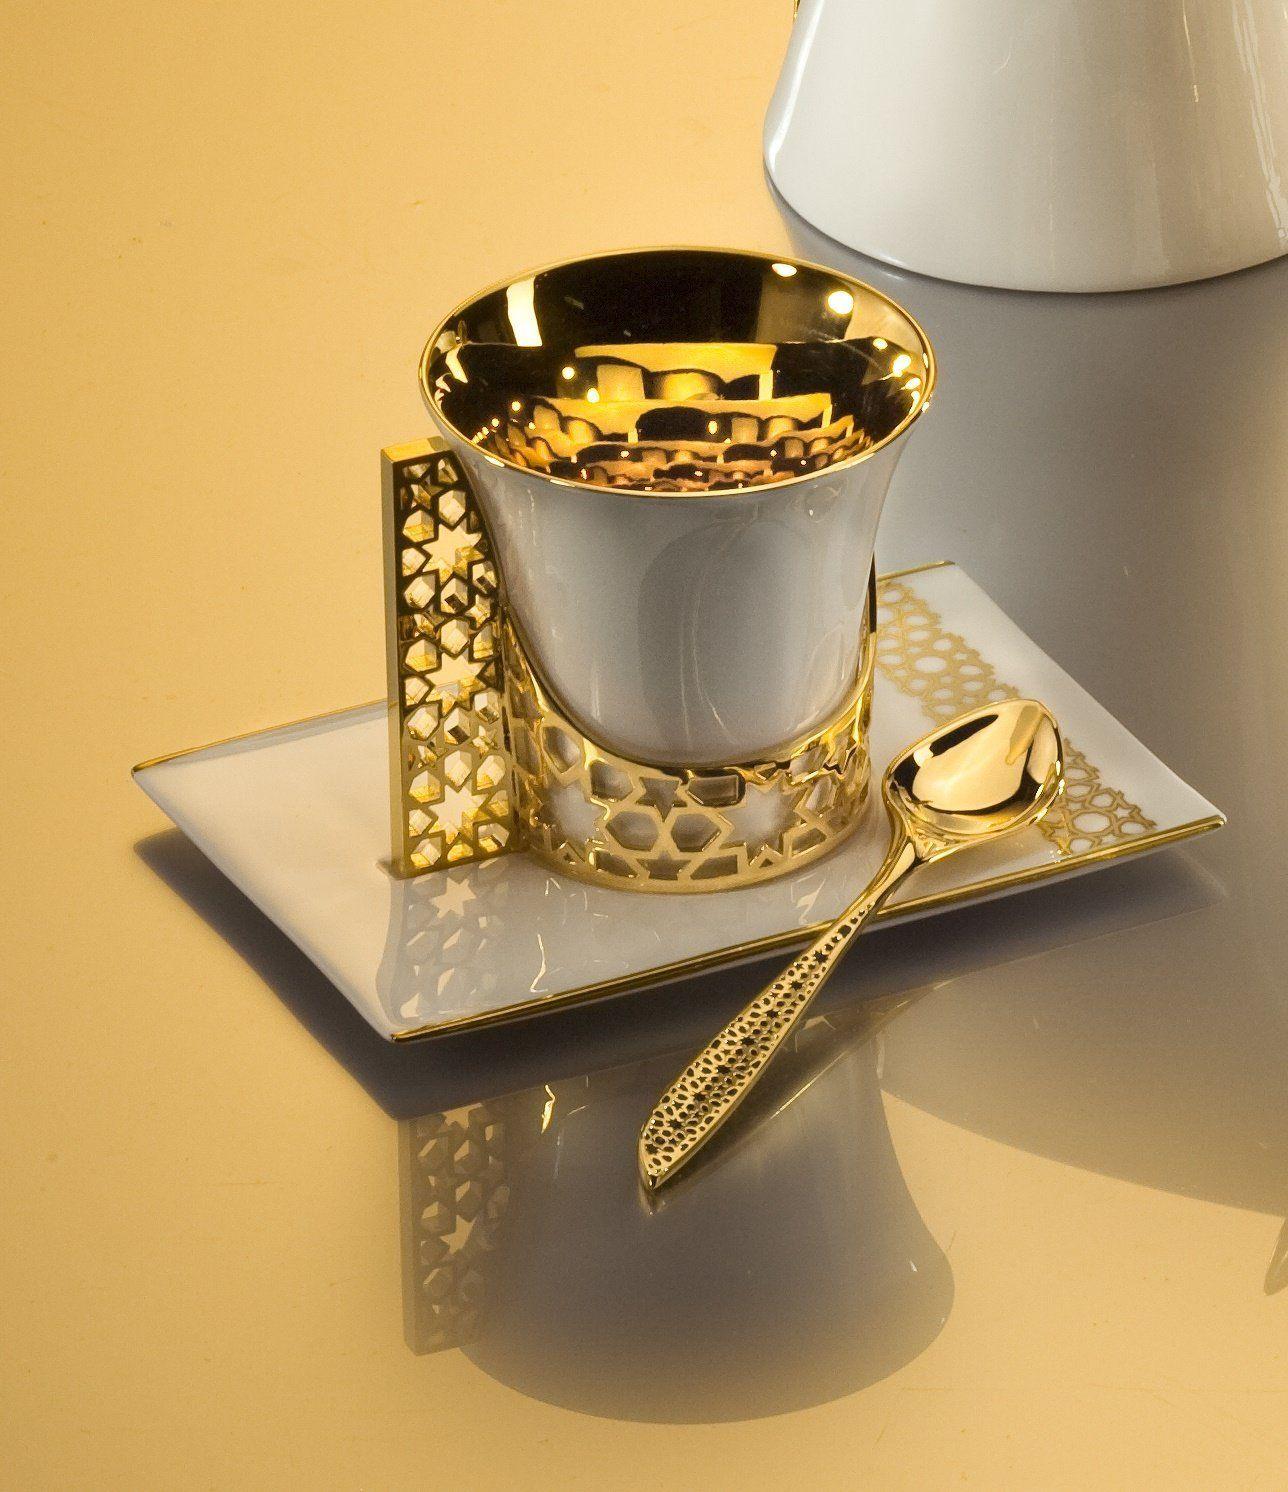 Unusual Coffee Cups Part - 35: Gold U0026 Titanium Plated Coffee Mug